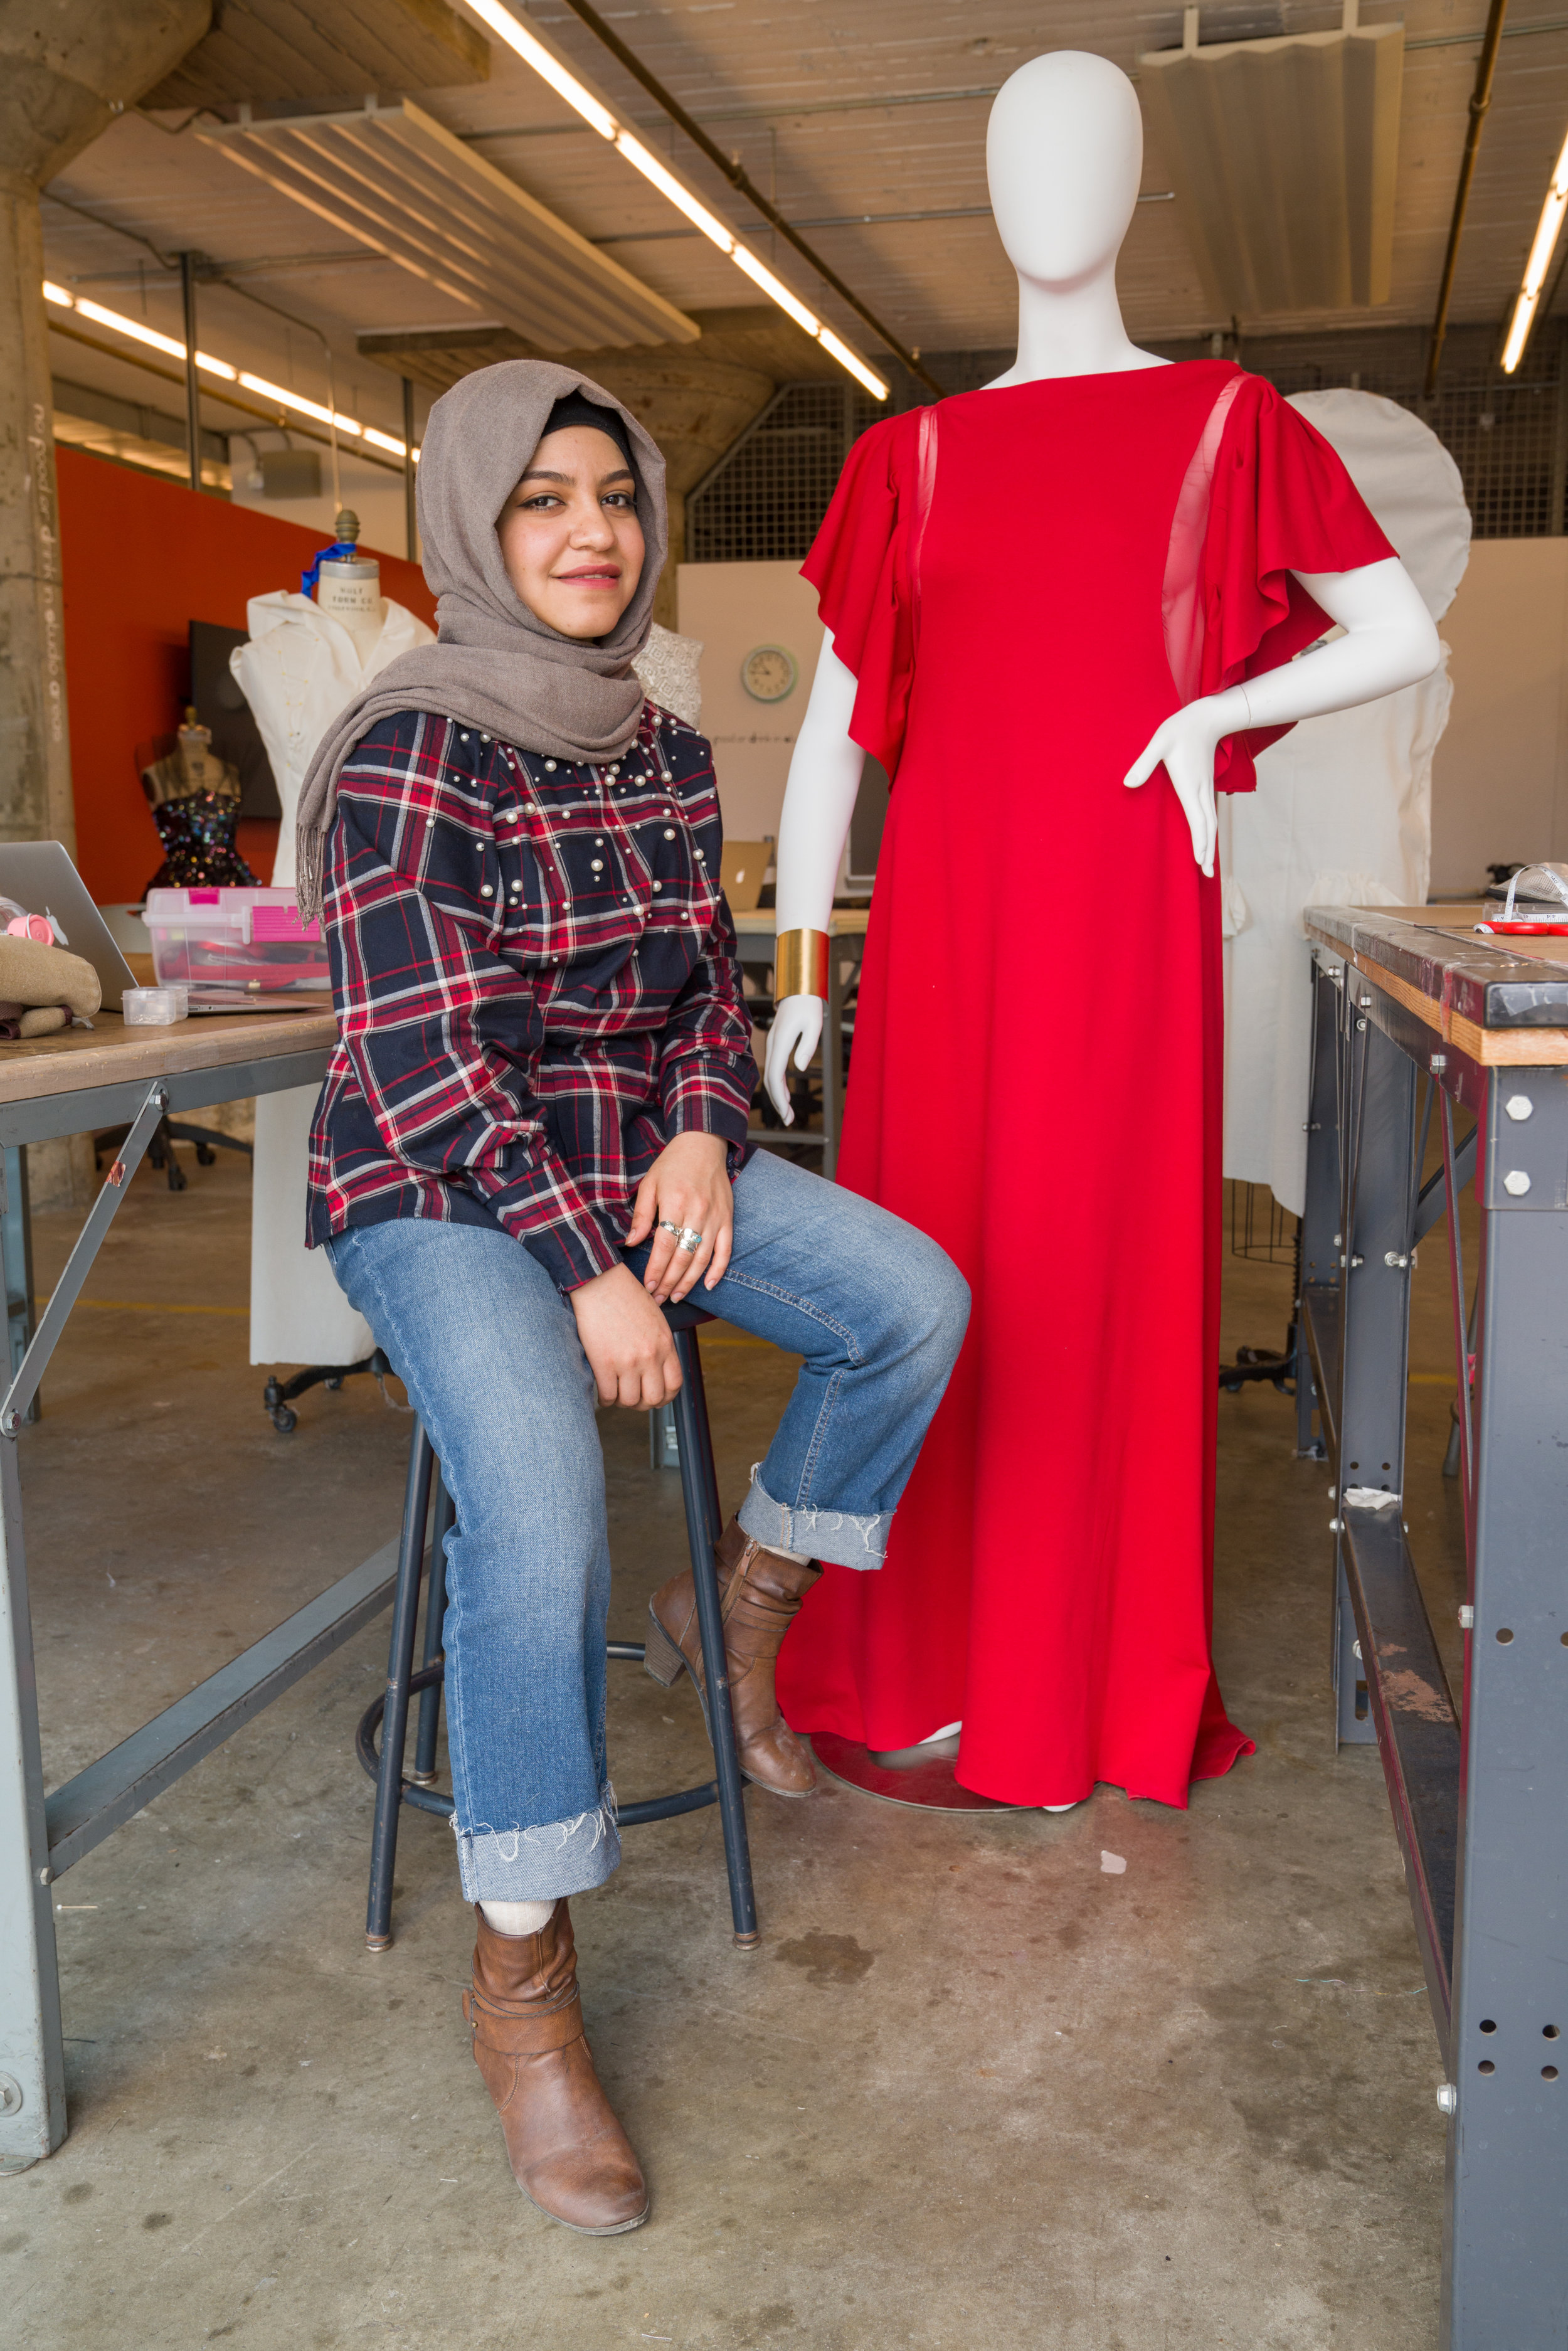 Fashion Without Limits 2019 Winner Kalthom Aljiboury